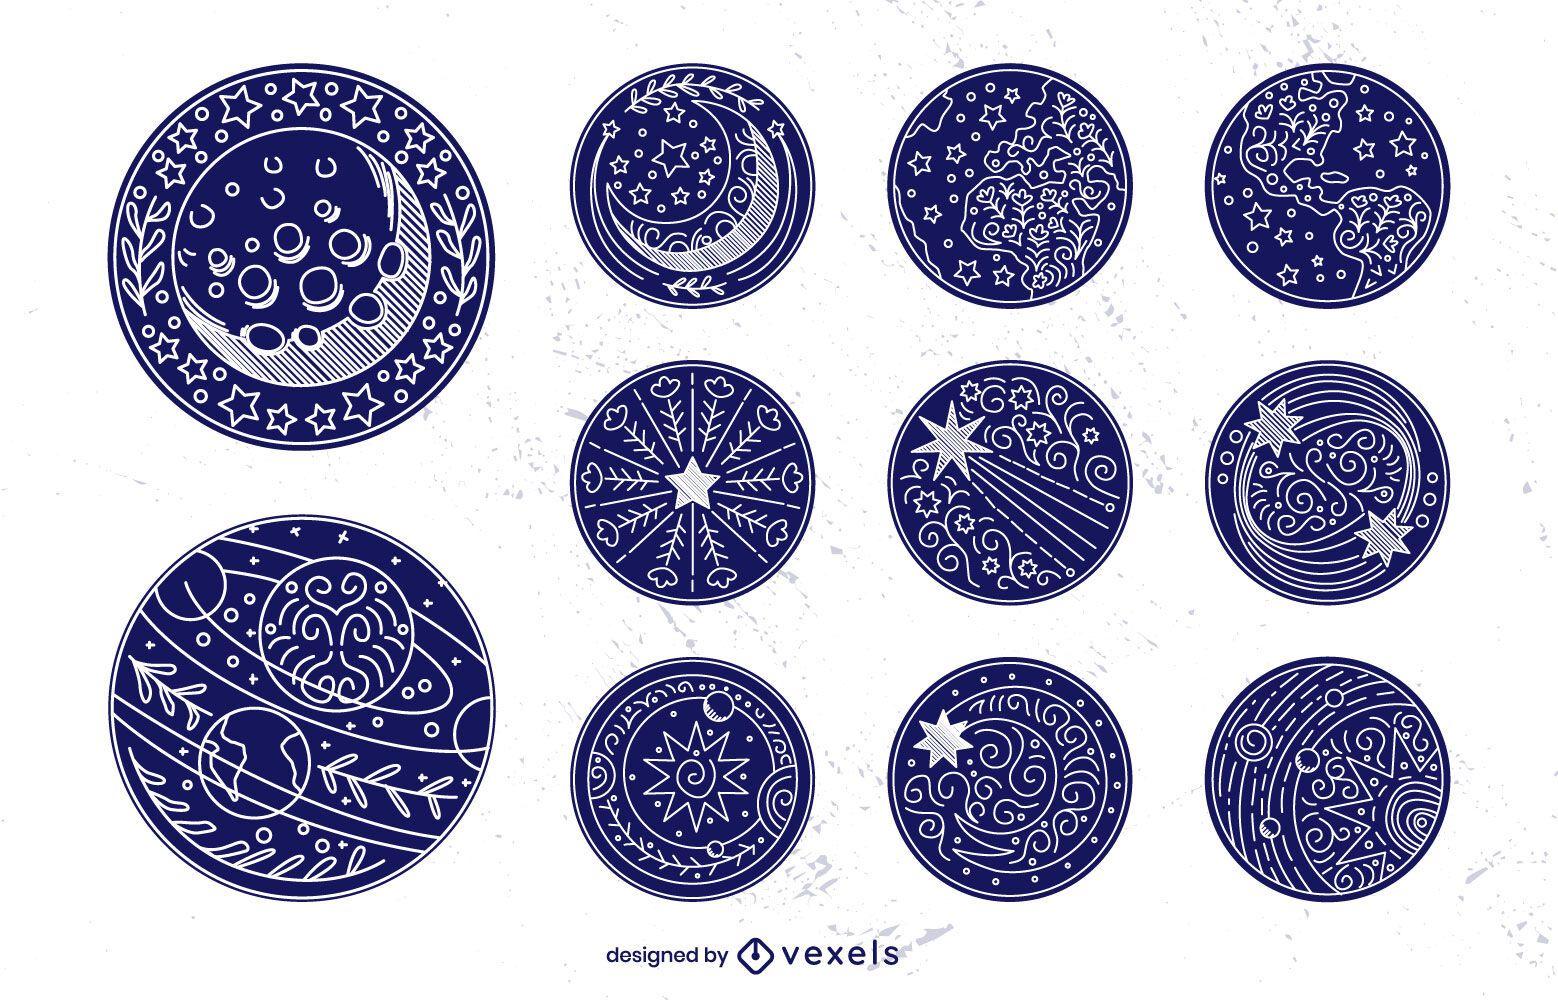 Space elements stroke badge set